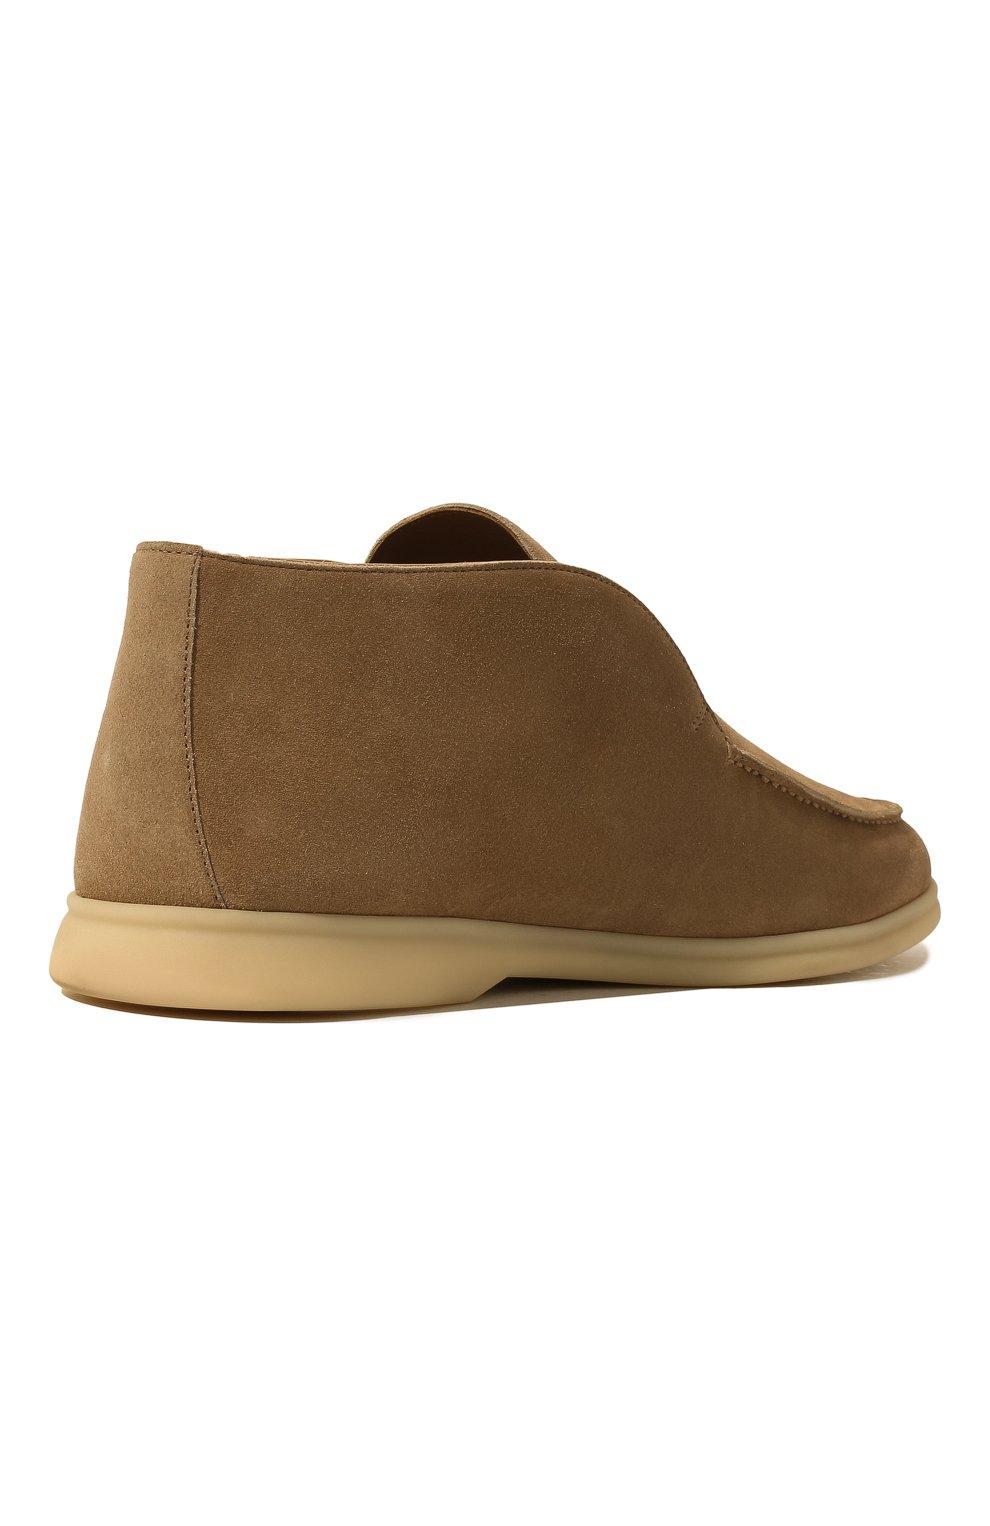 Мужские замшевые ботинки open walk LORO PIANA бежевого цвета, арт. FAB4368 | Фото 5